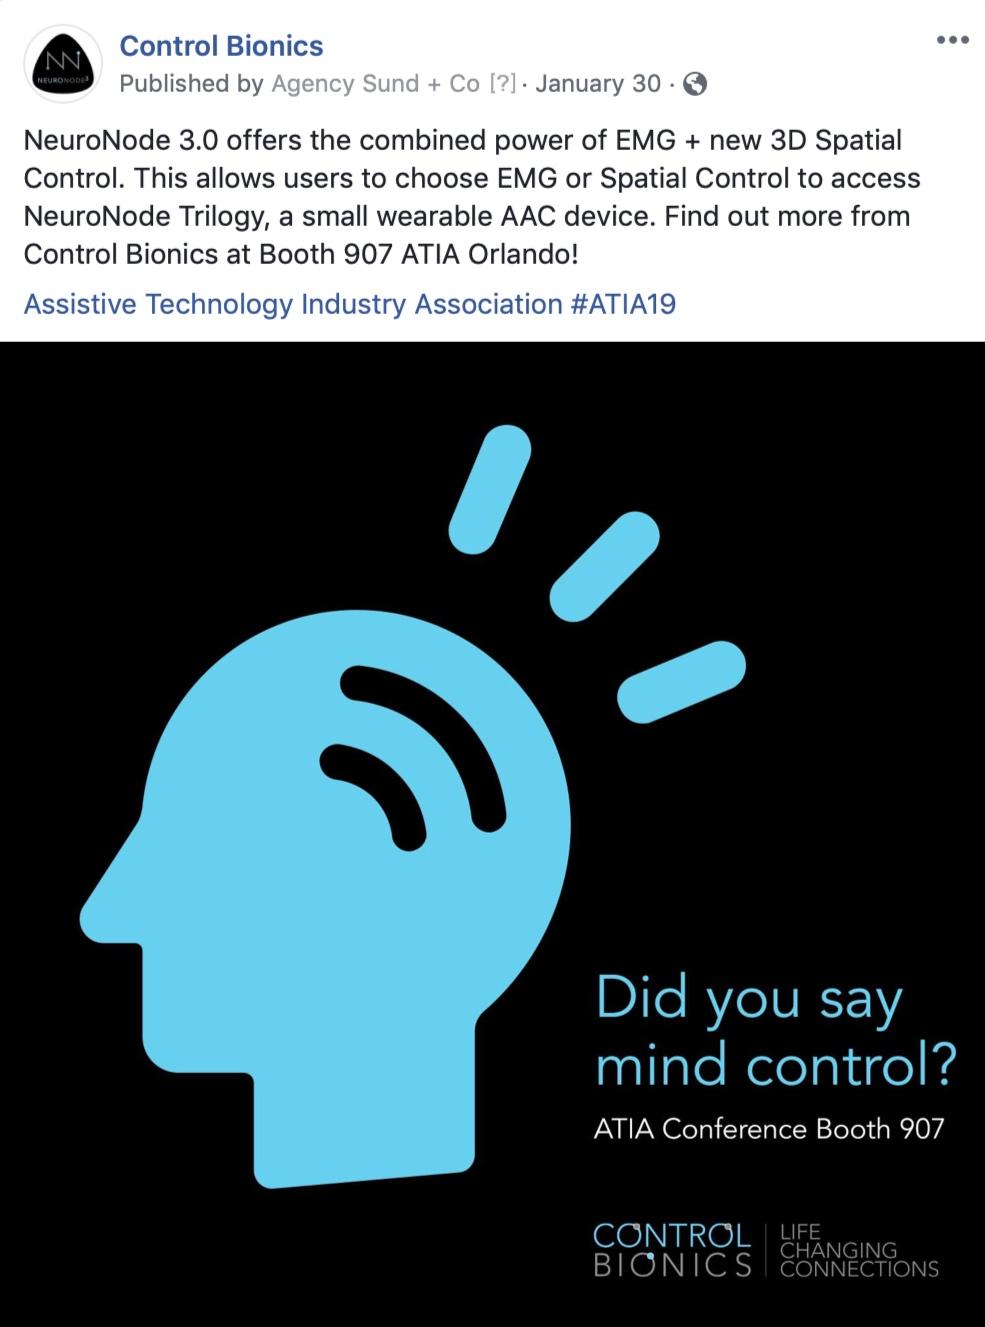 19 01 30 ATIA Power of 3 Mind Control.jpg